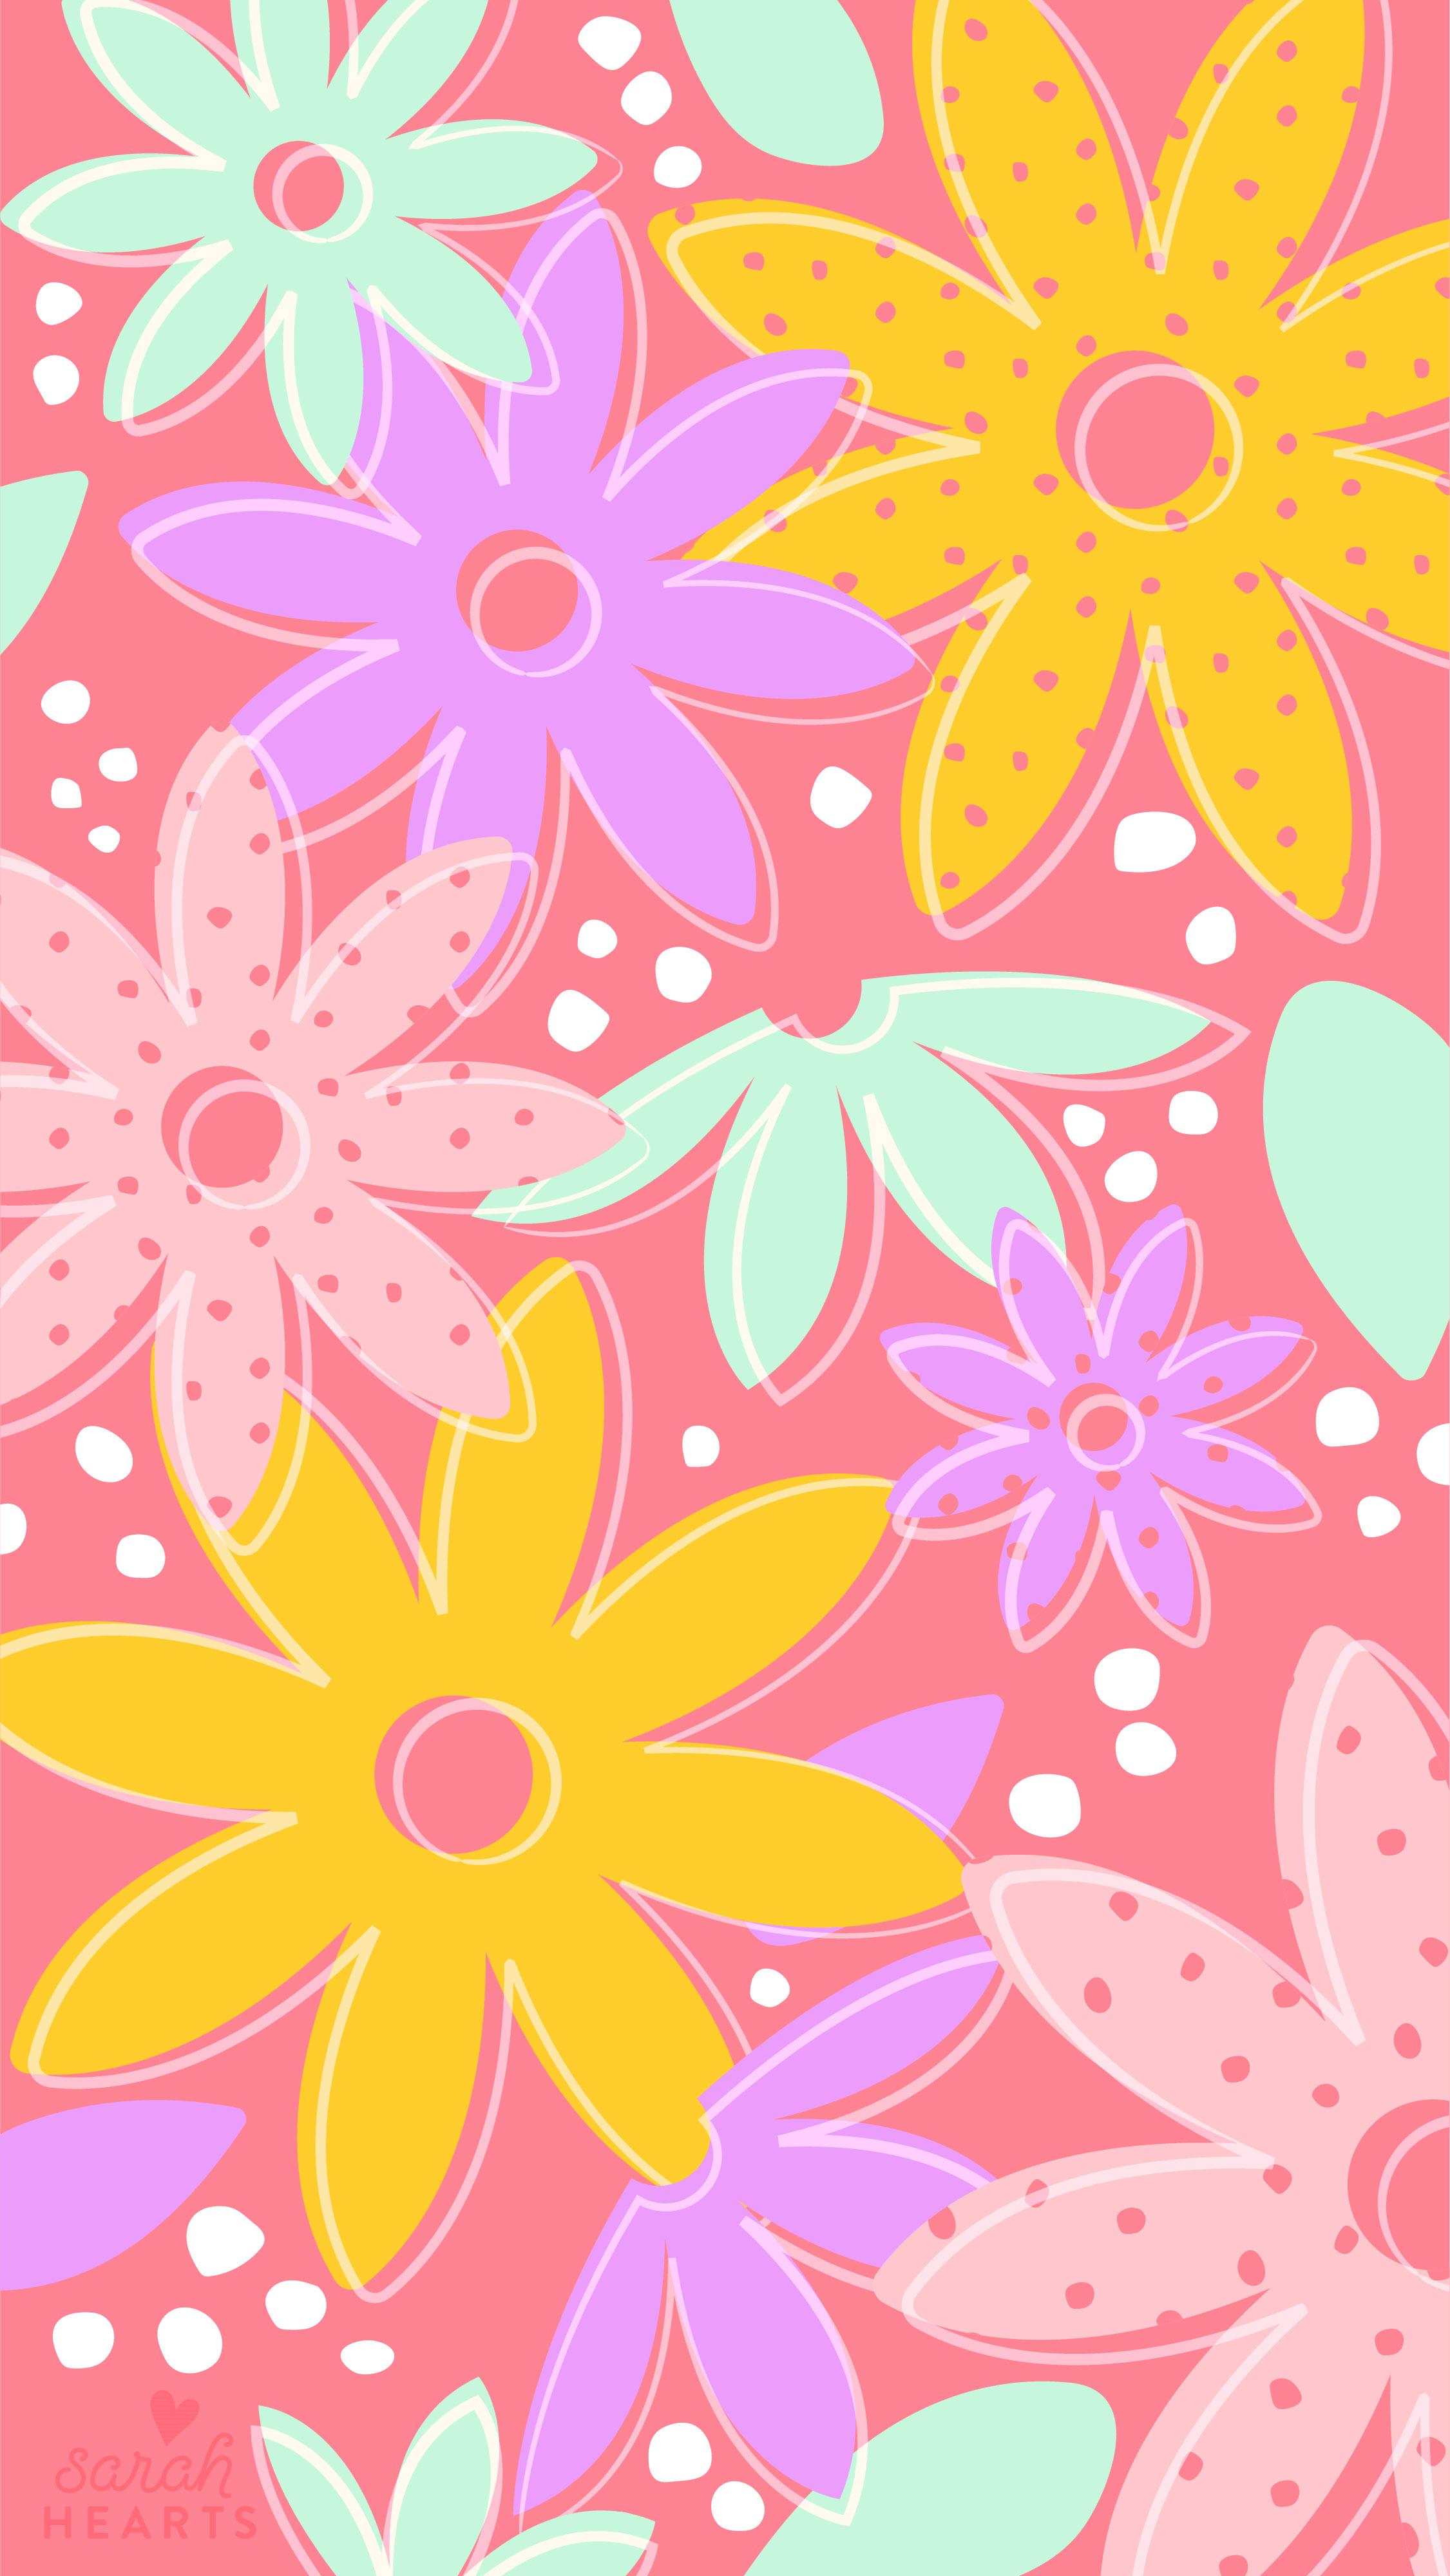 May 2019 Flower Calendar Wallpaper Sarah Hearts